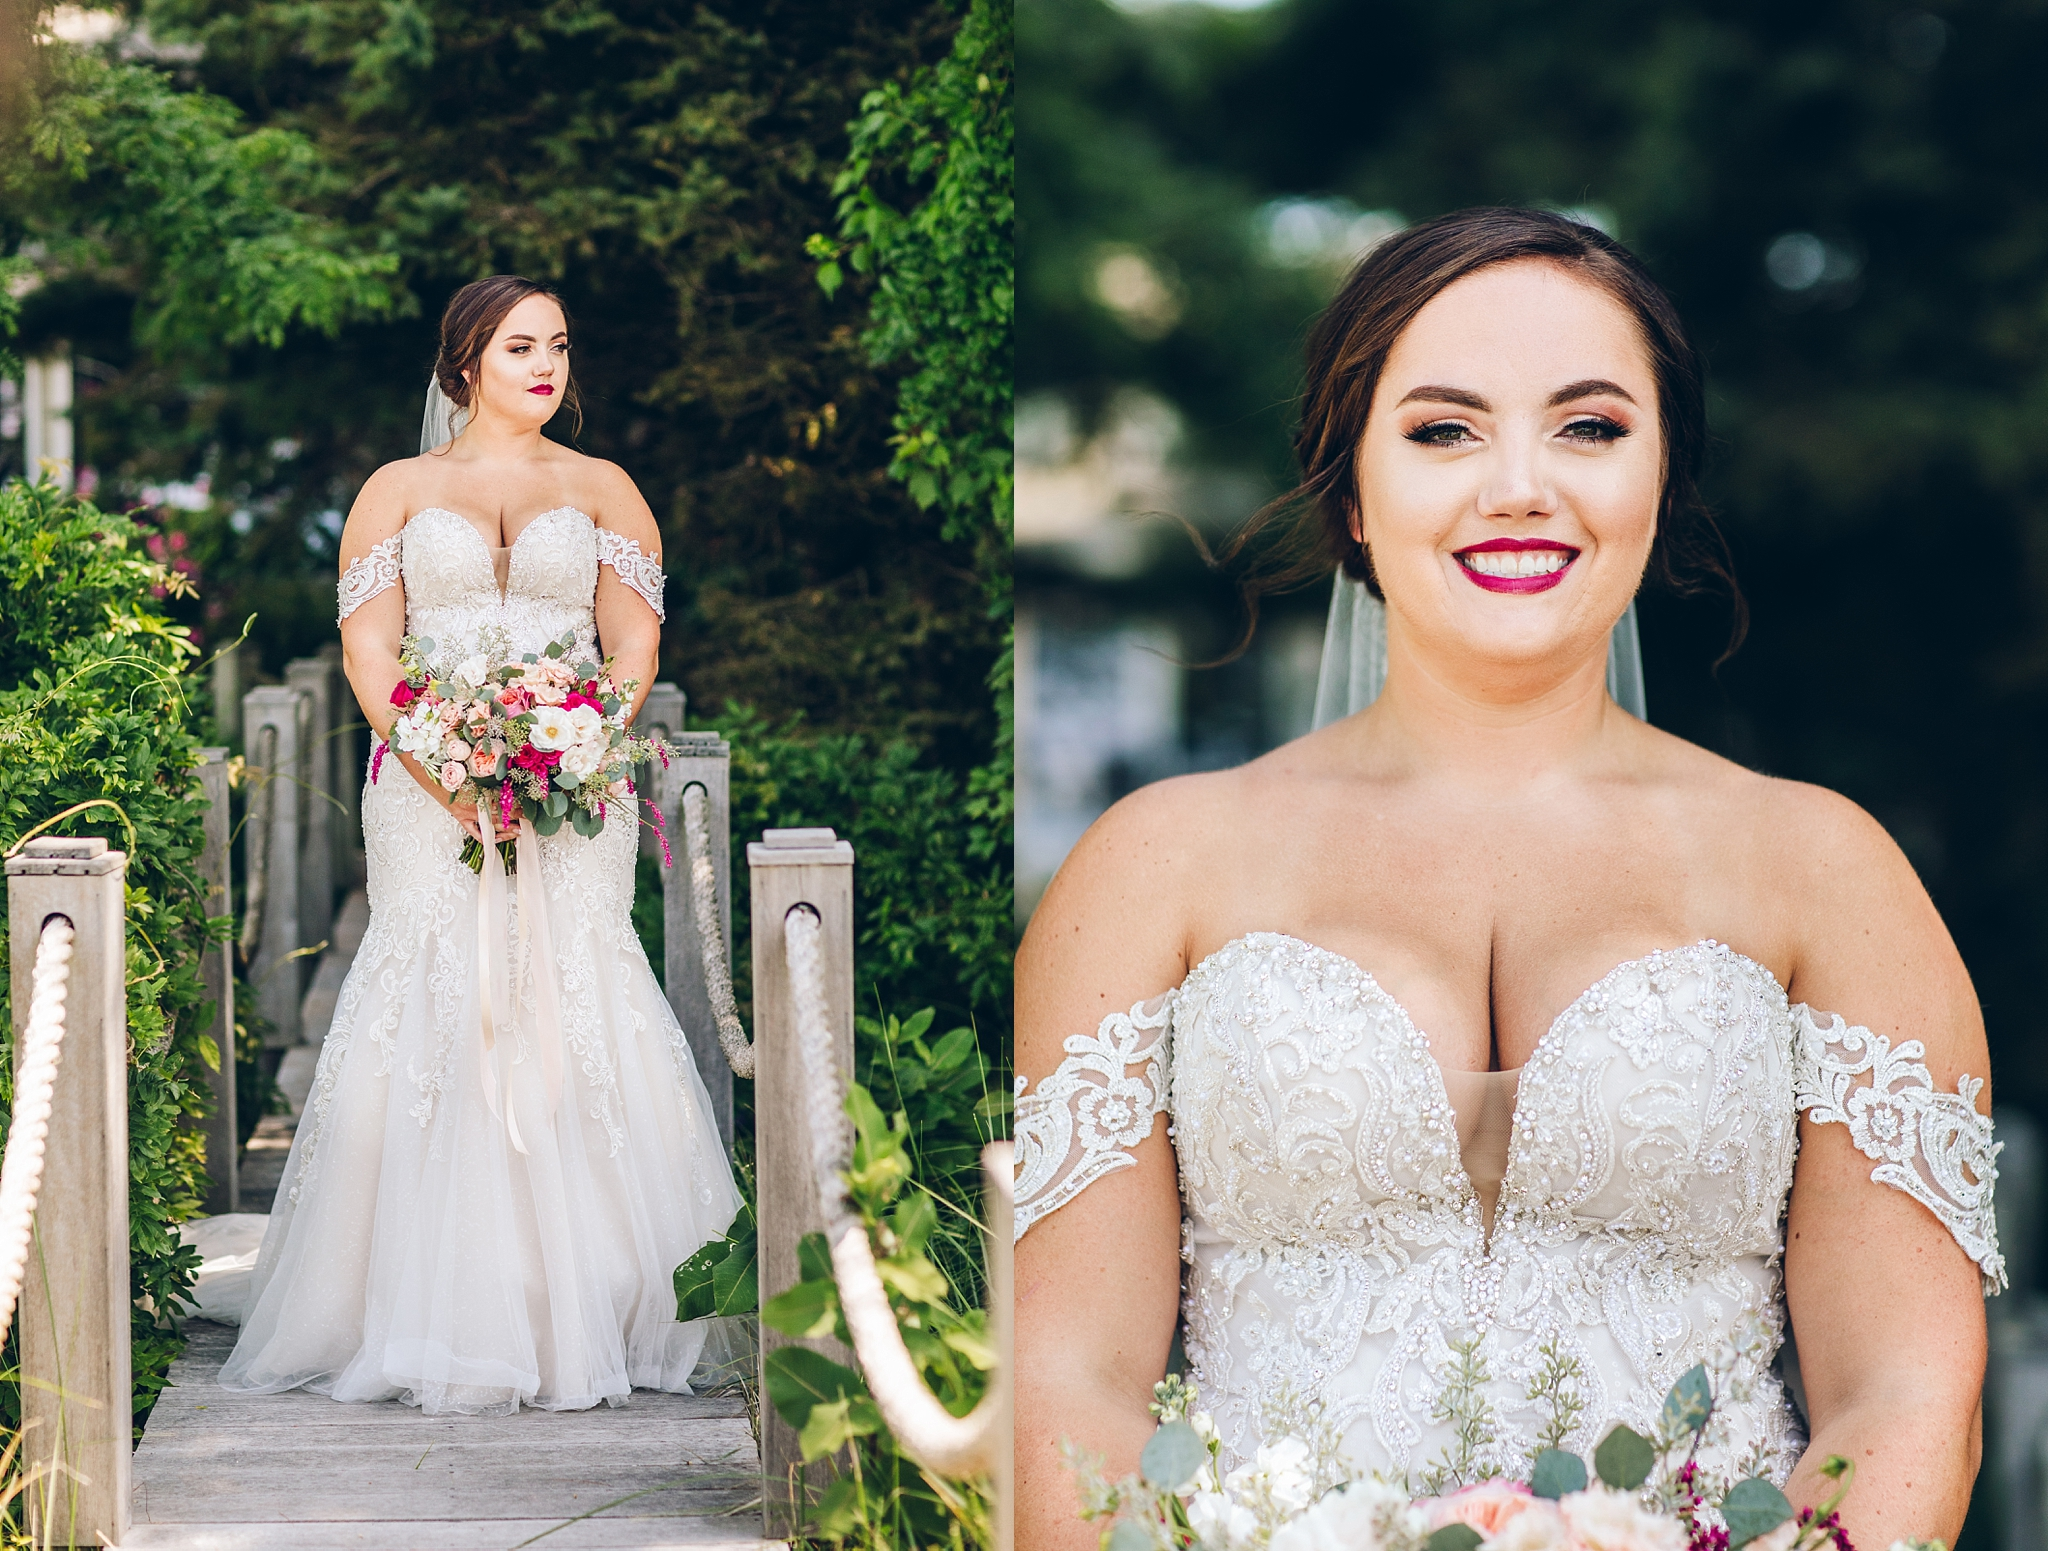 baker-lofts-holland-michigan-wedding-photographer_0311.jpg